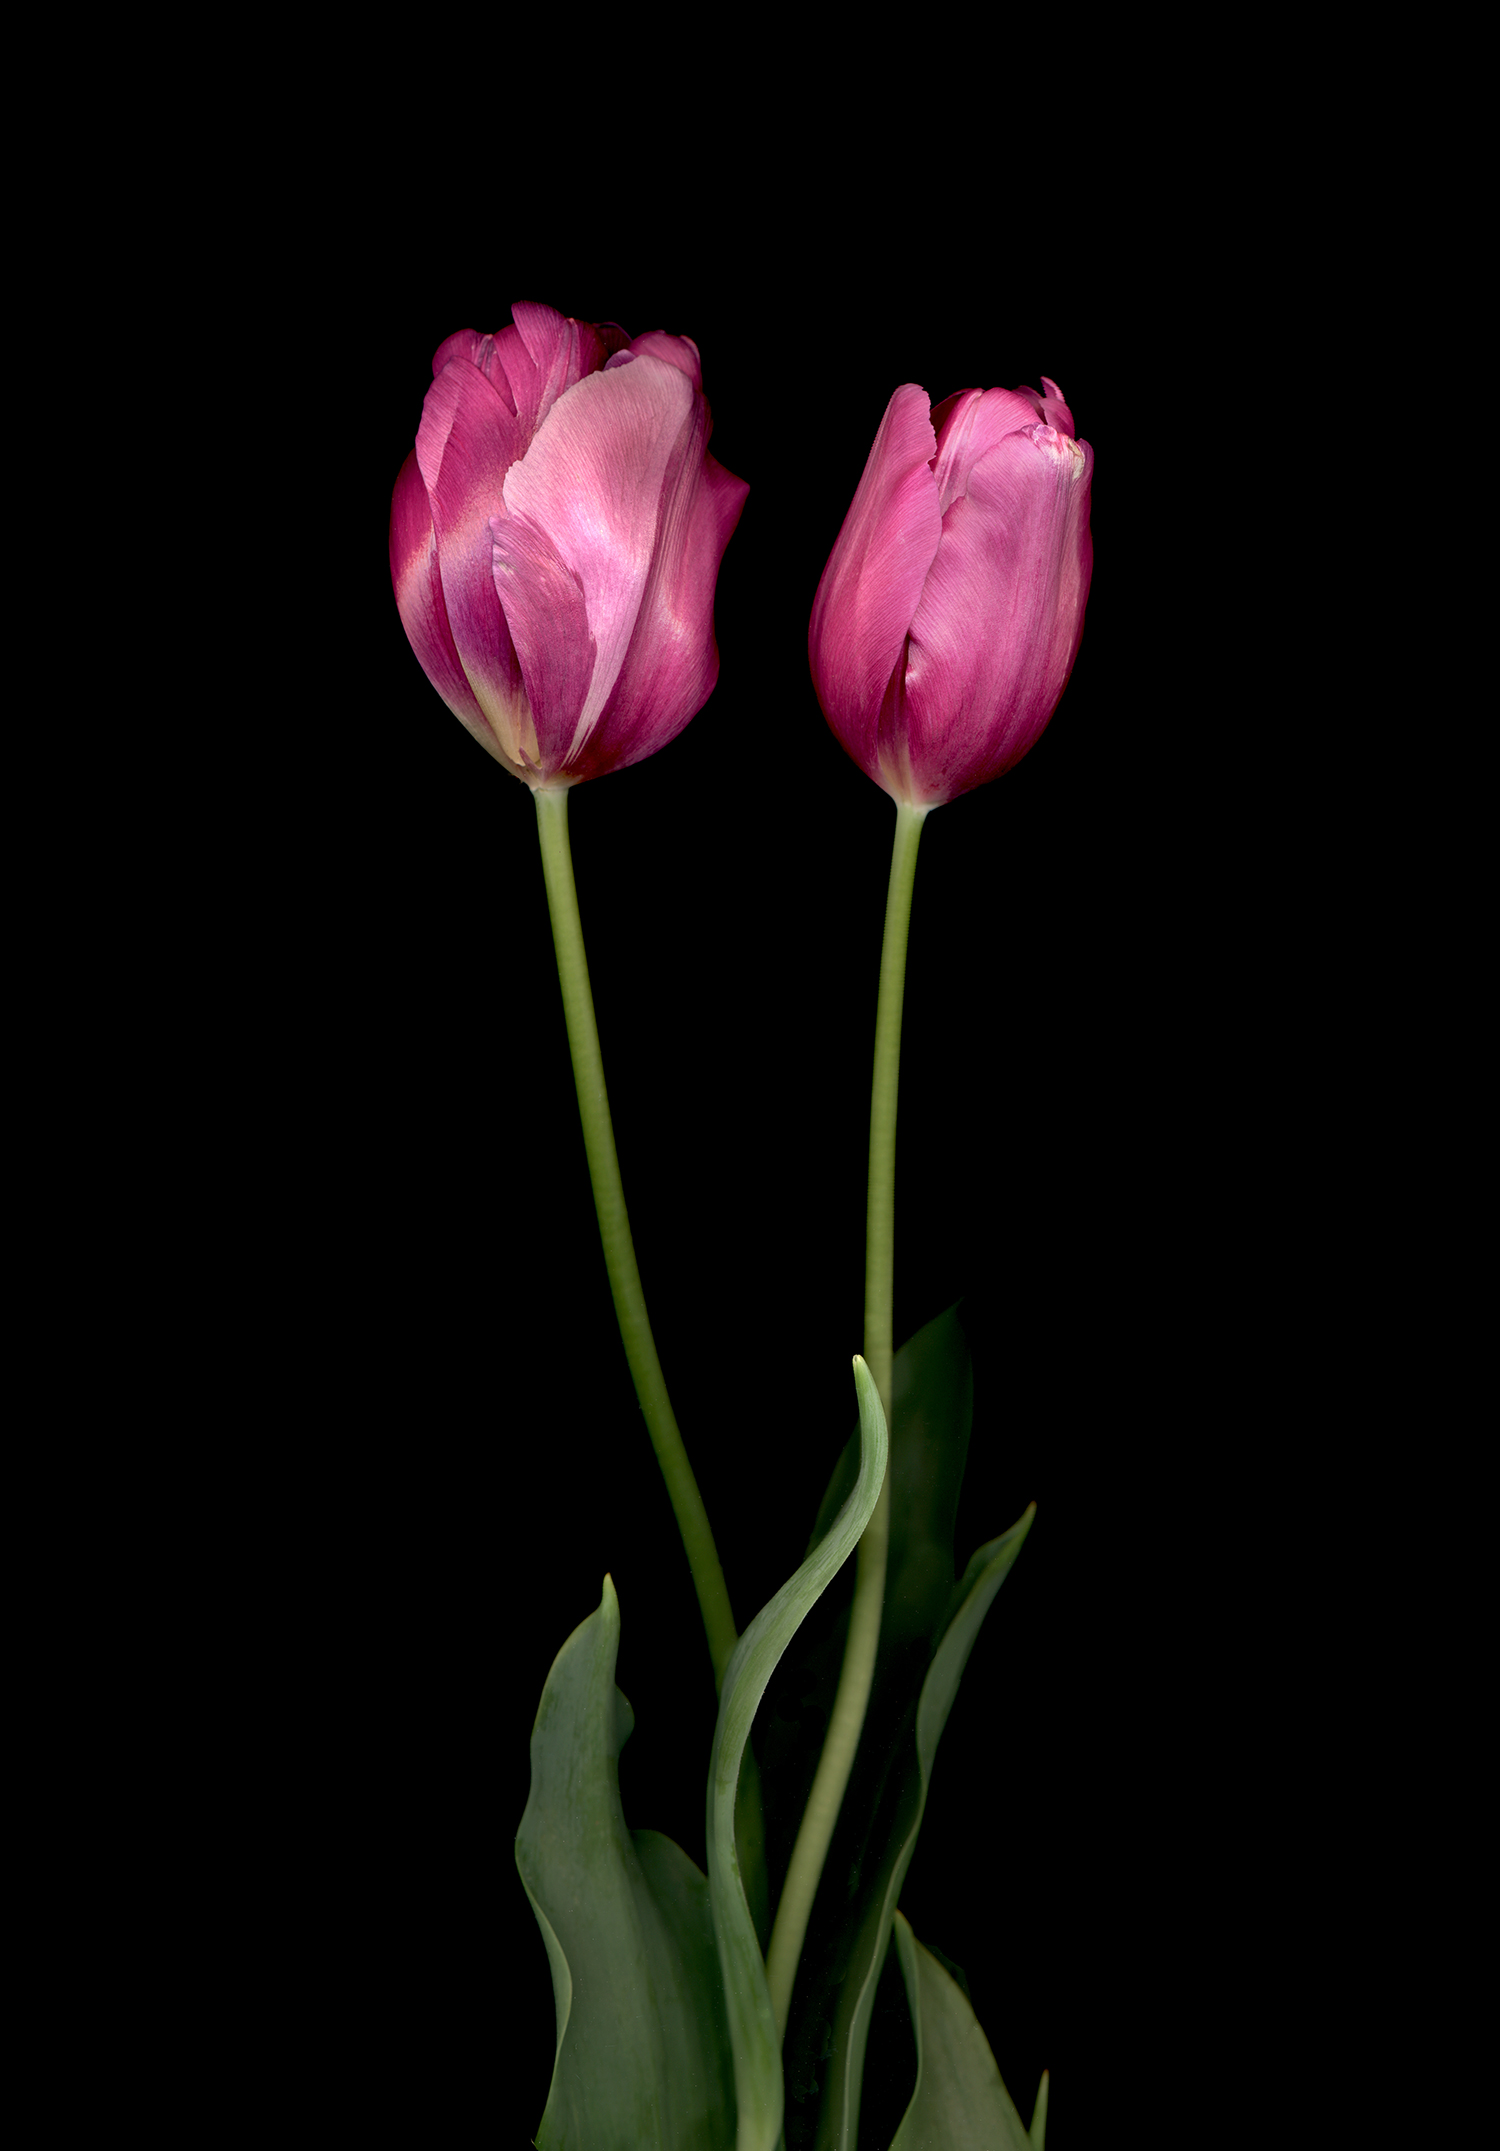 spring_tulips.jpg